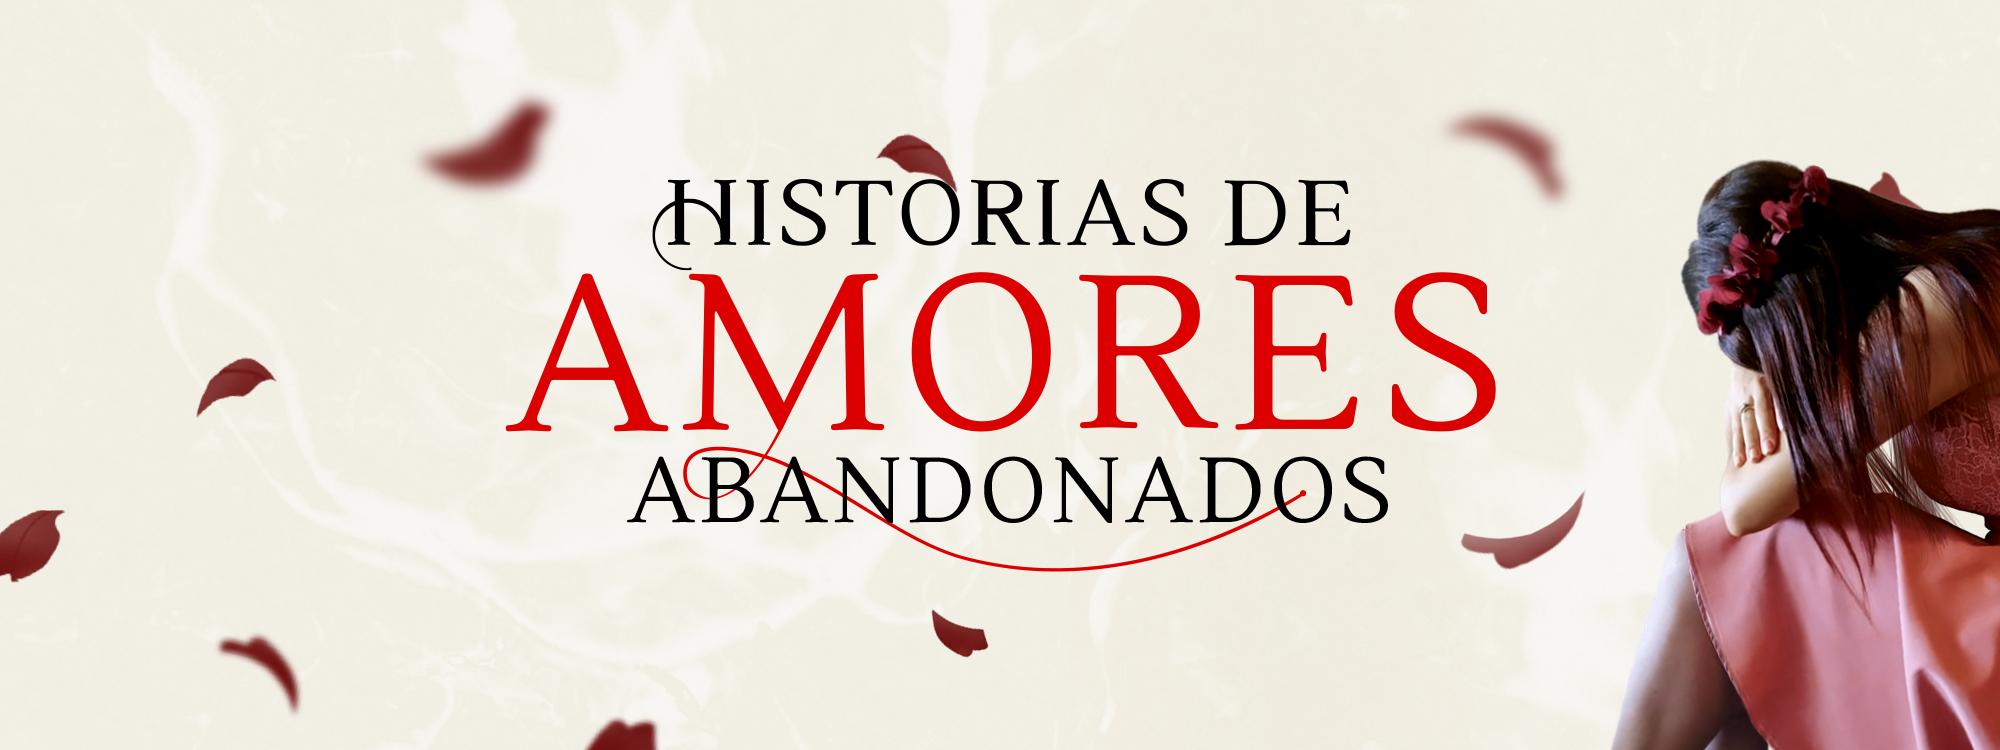 Banners - Historias de amores abandonados